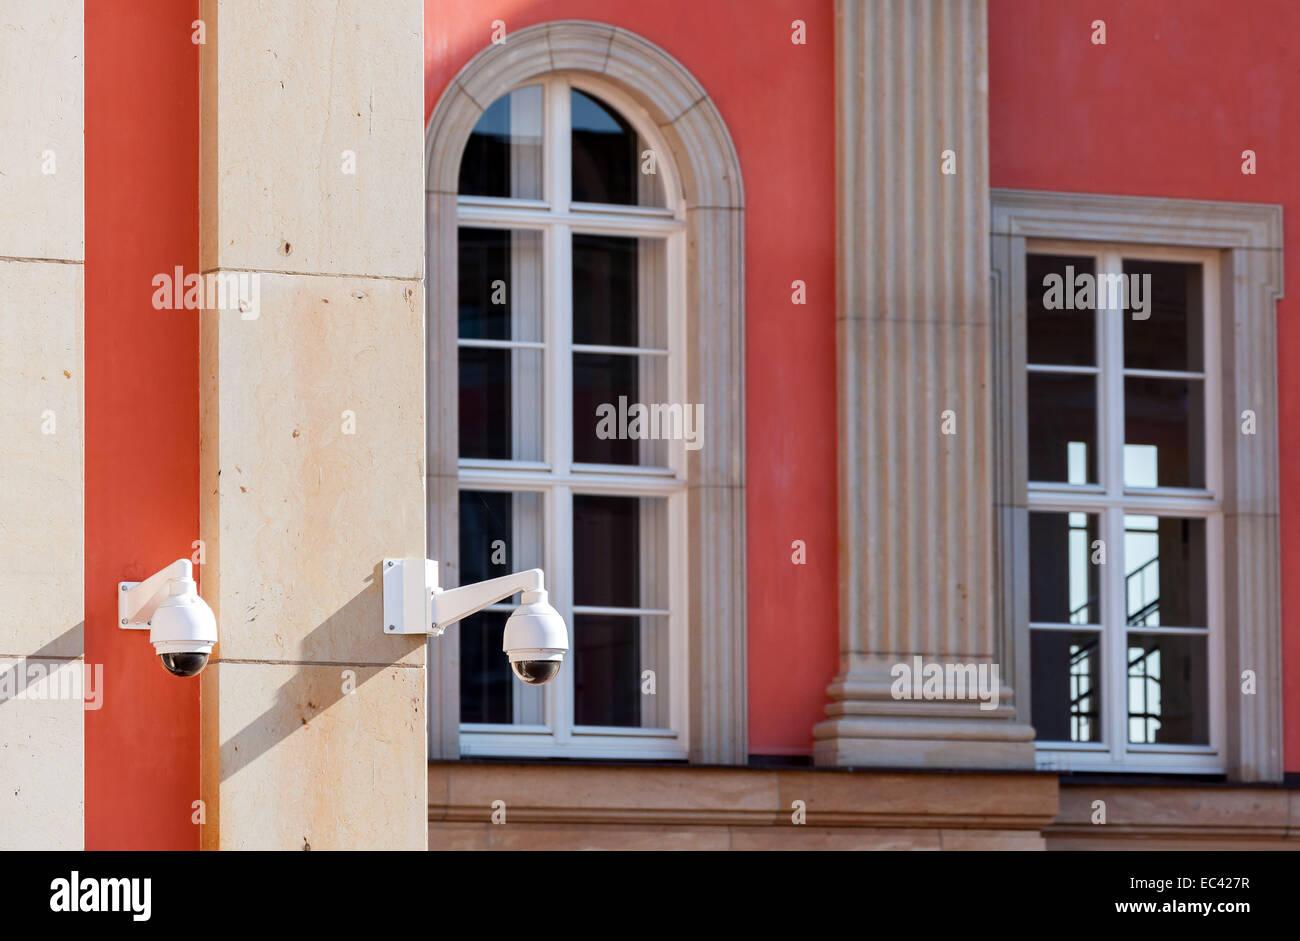 Surveillance camera on a public building Stock Photo